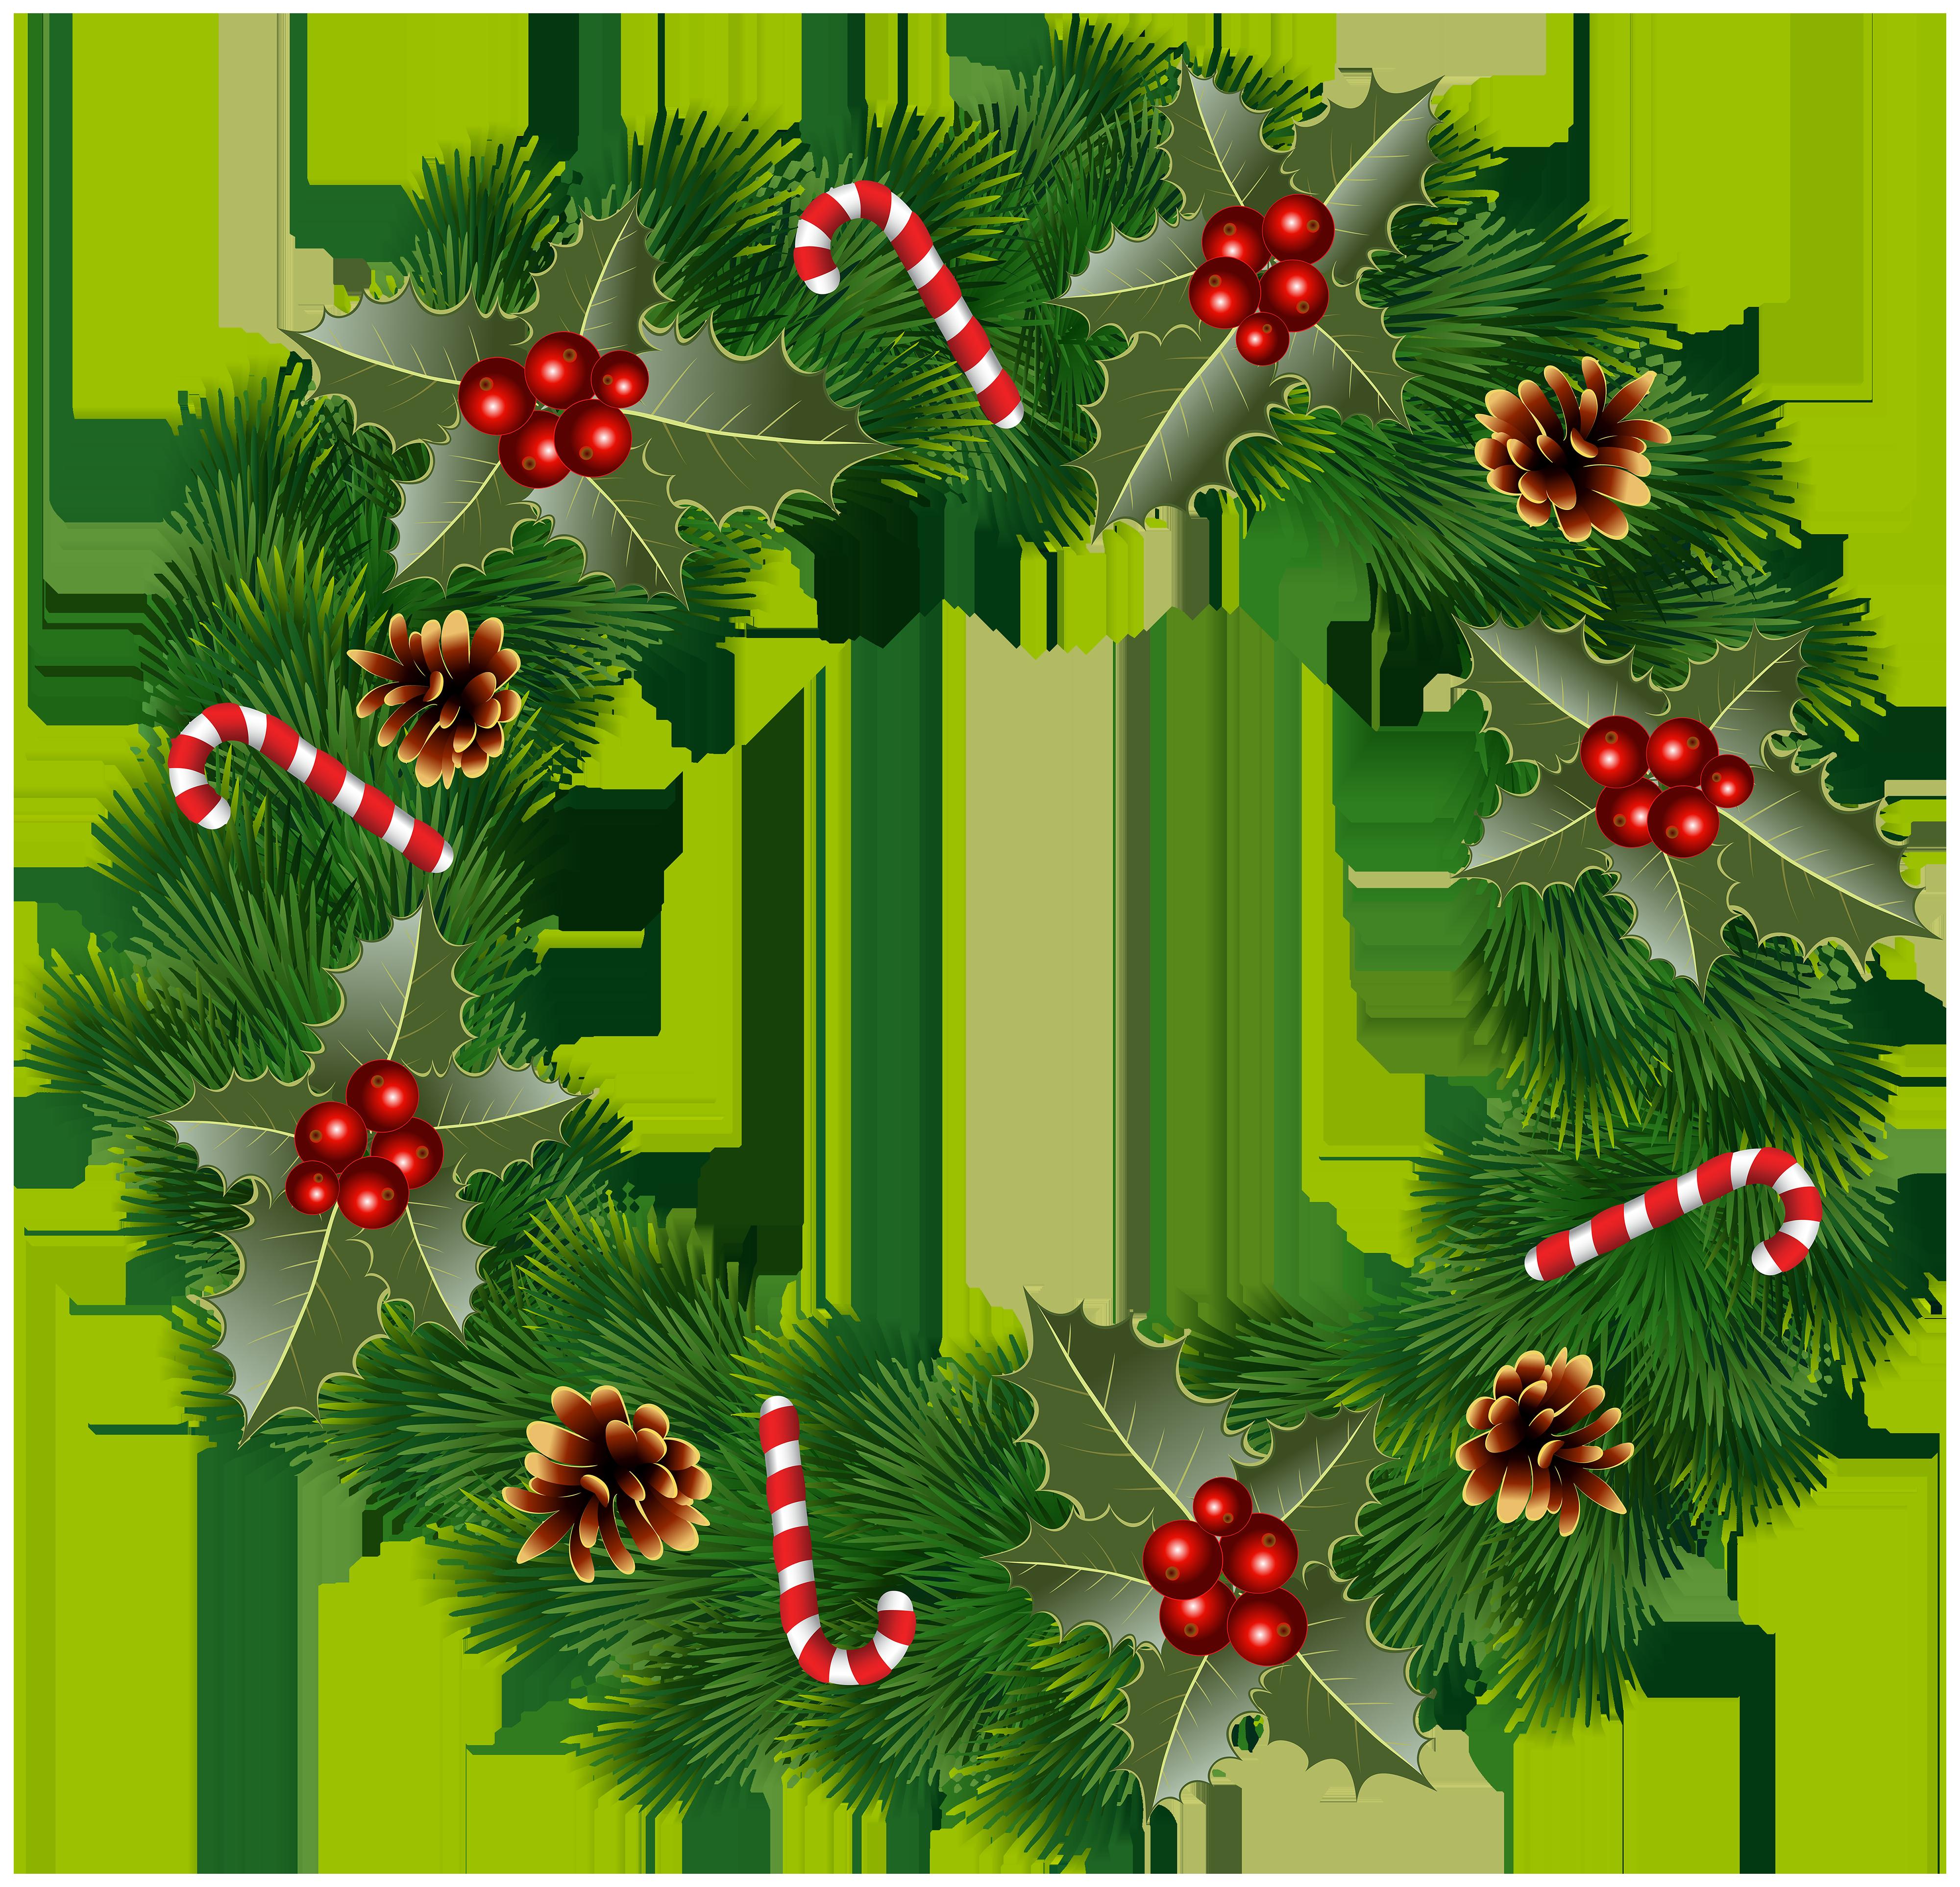 Christmas Wreath Clip Art Image.